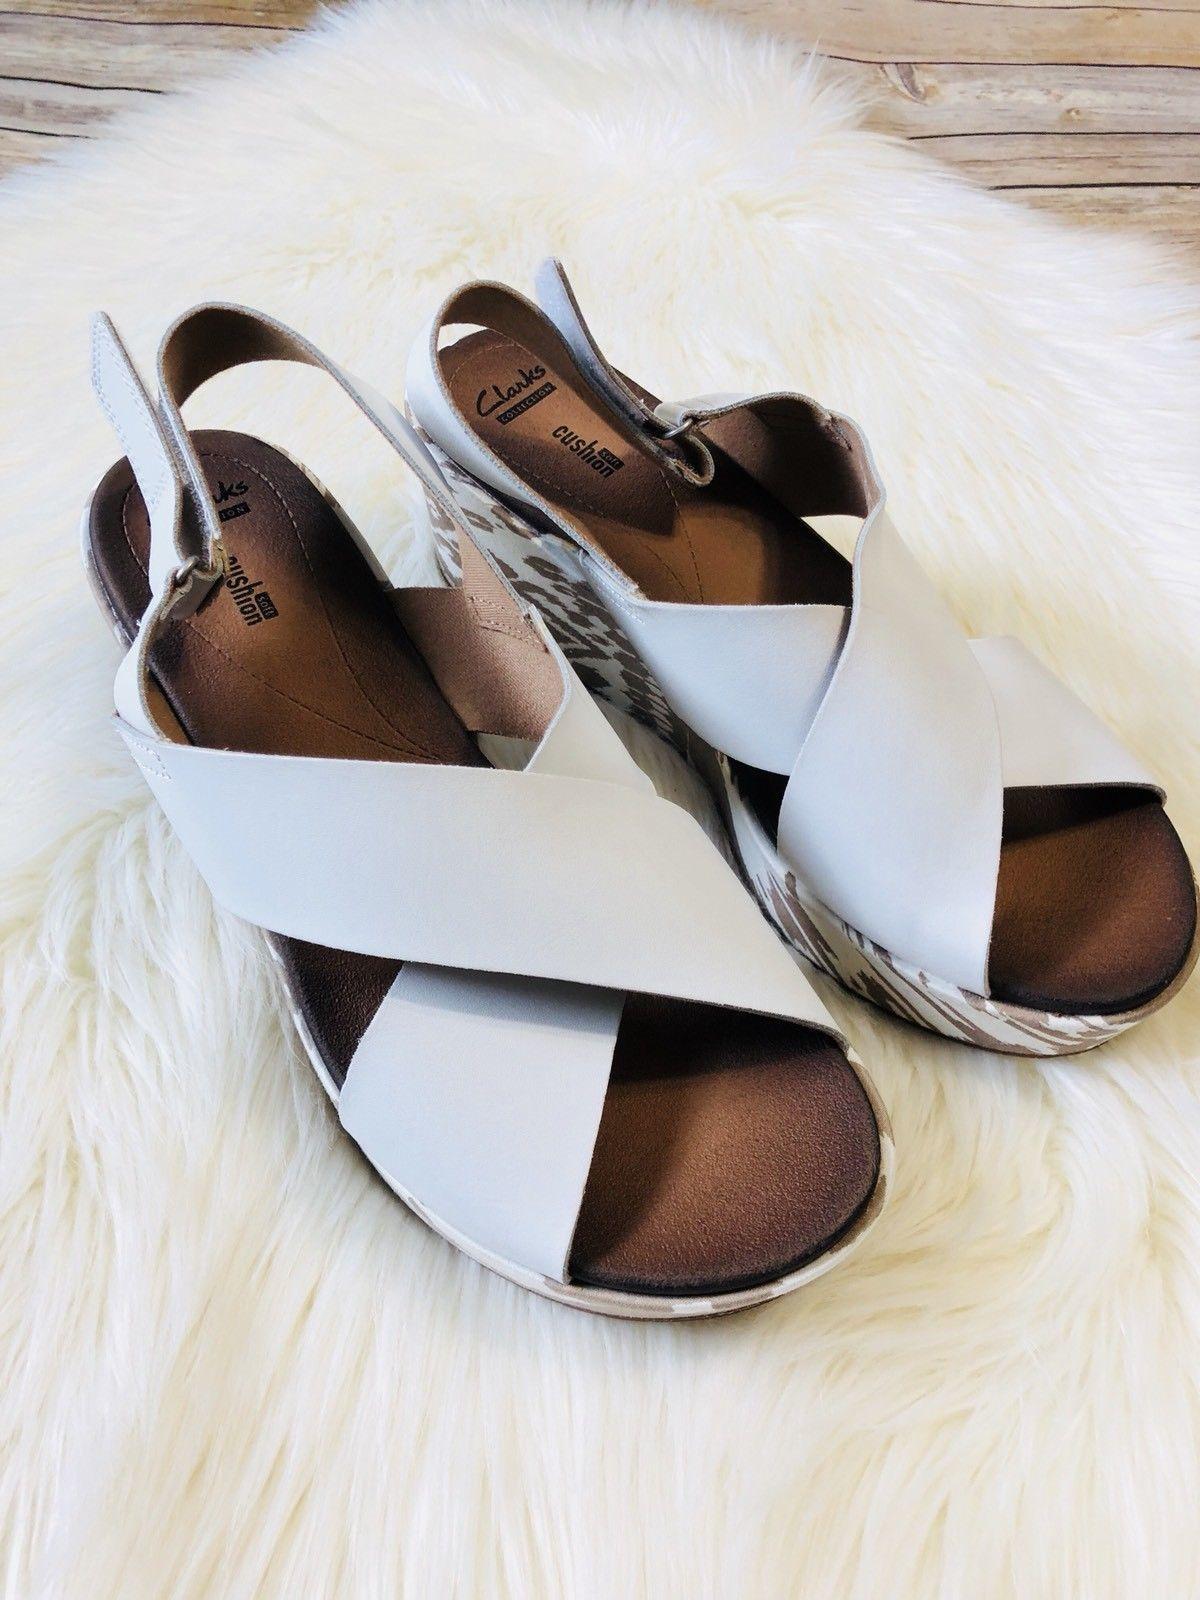 e3cbf4064ba S l1600. S l1600. Previous. Clarks Women s White Stasha Hale 4 Criss Cross  Slingback Wedge Sandals ...